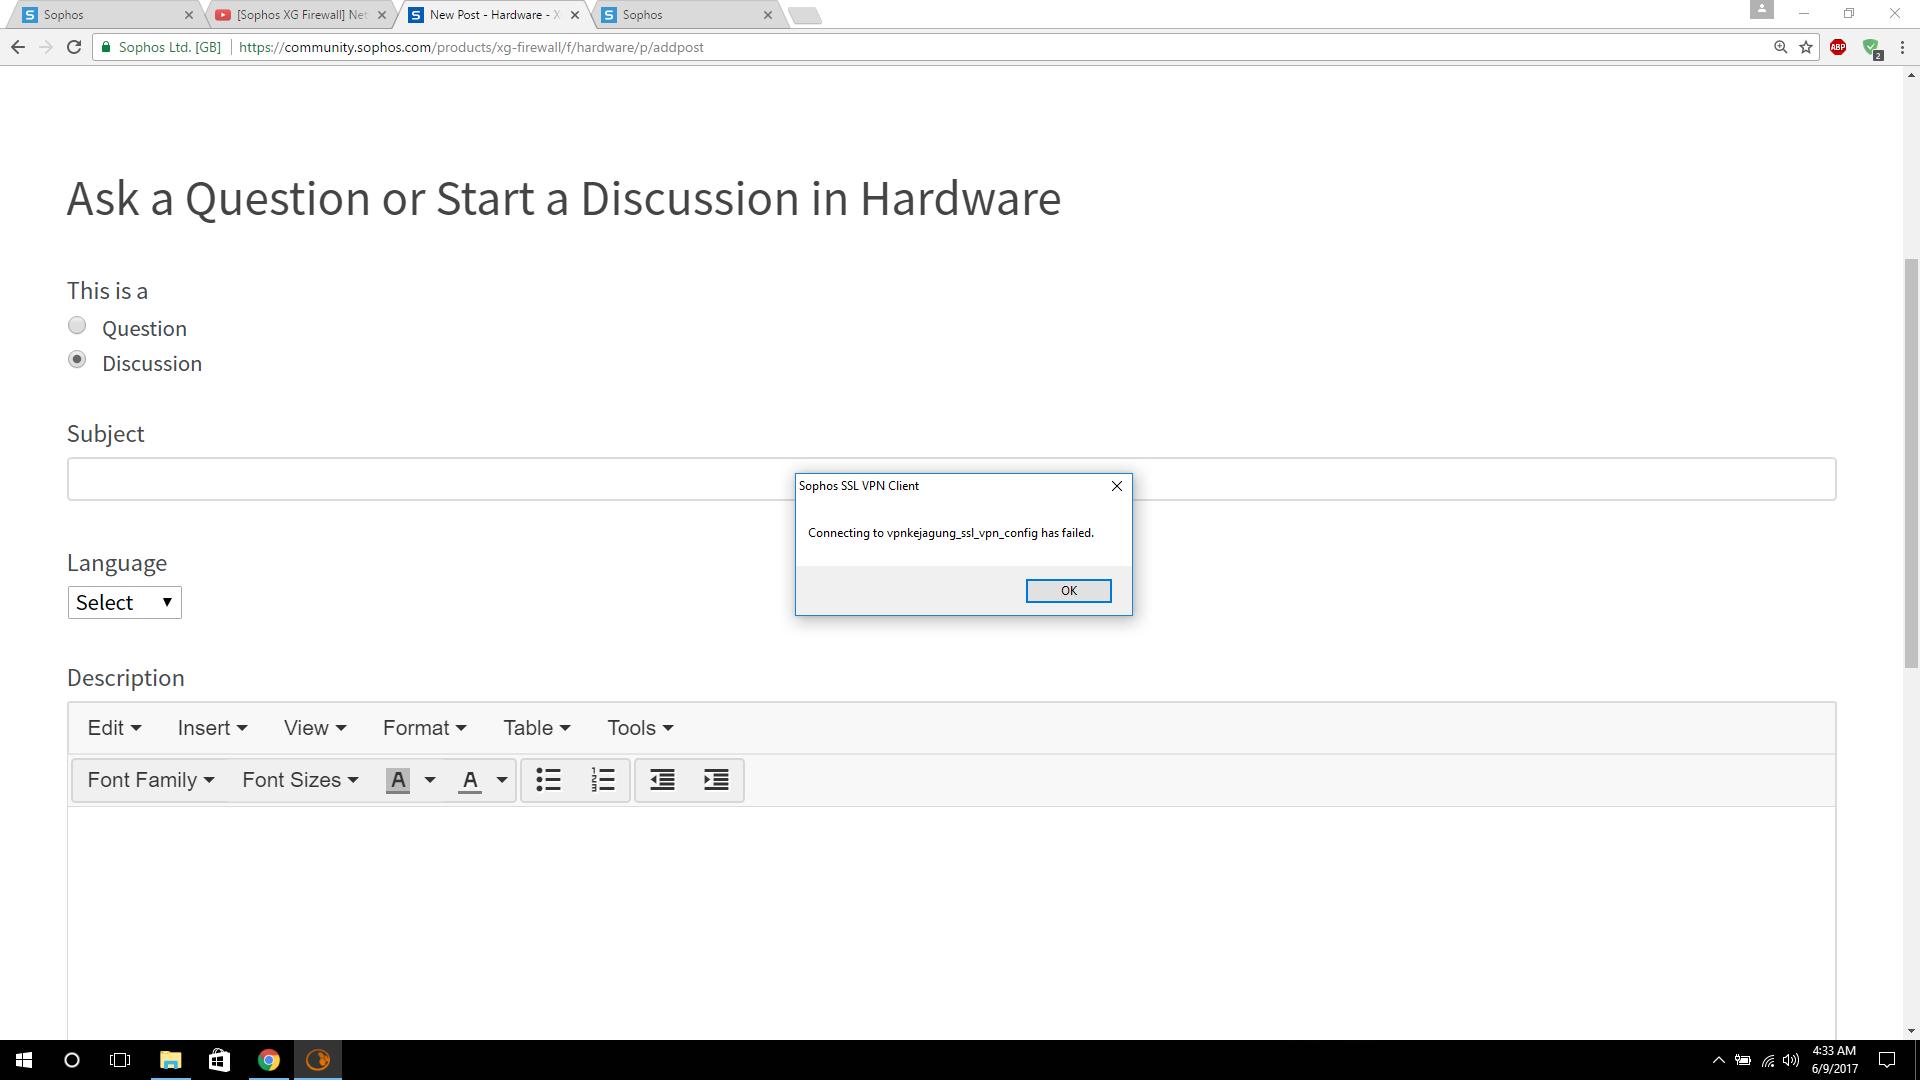 7725.Screenshot  2800 17 2900  - Sophos Ssl Vpn Client Windows 7